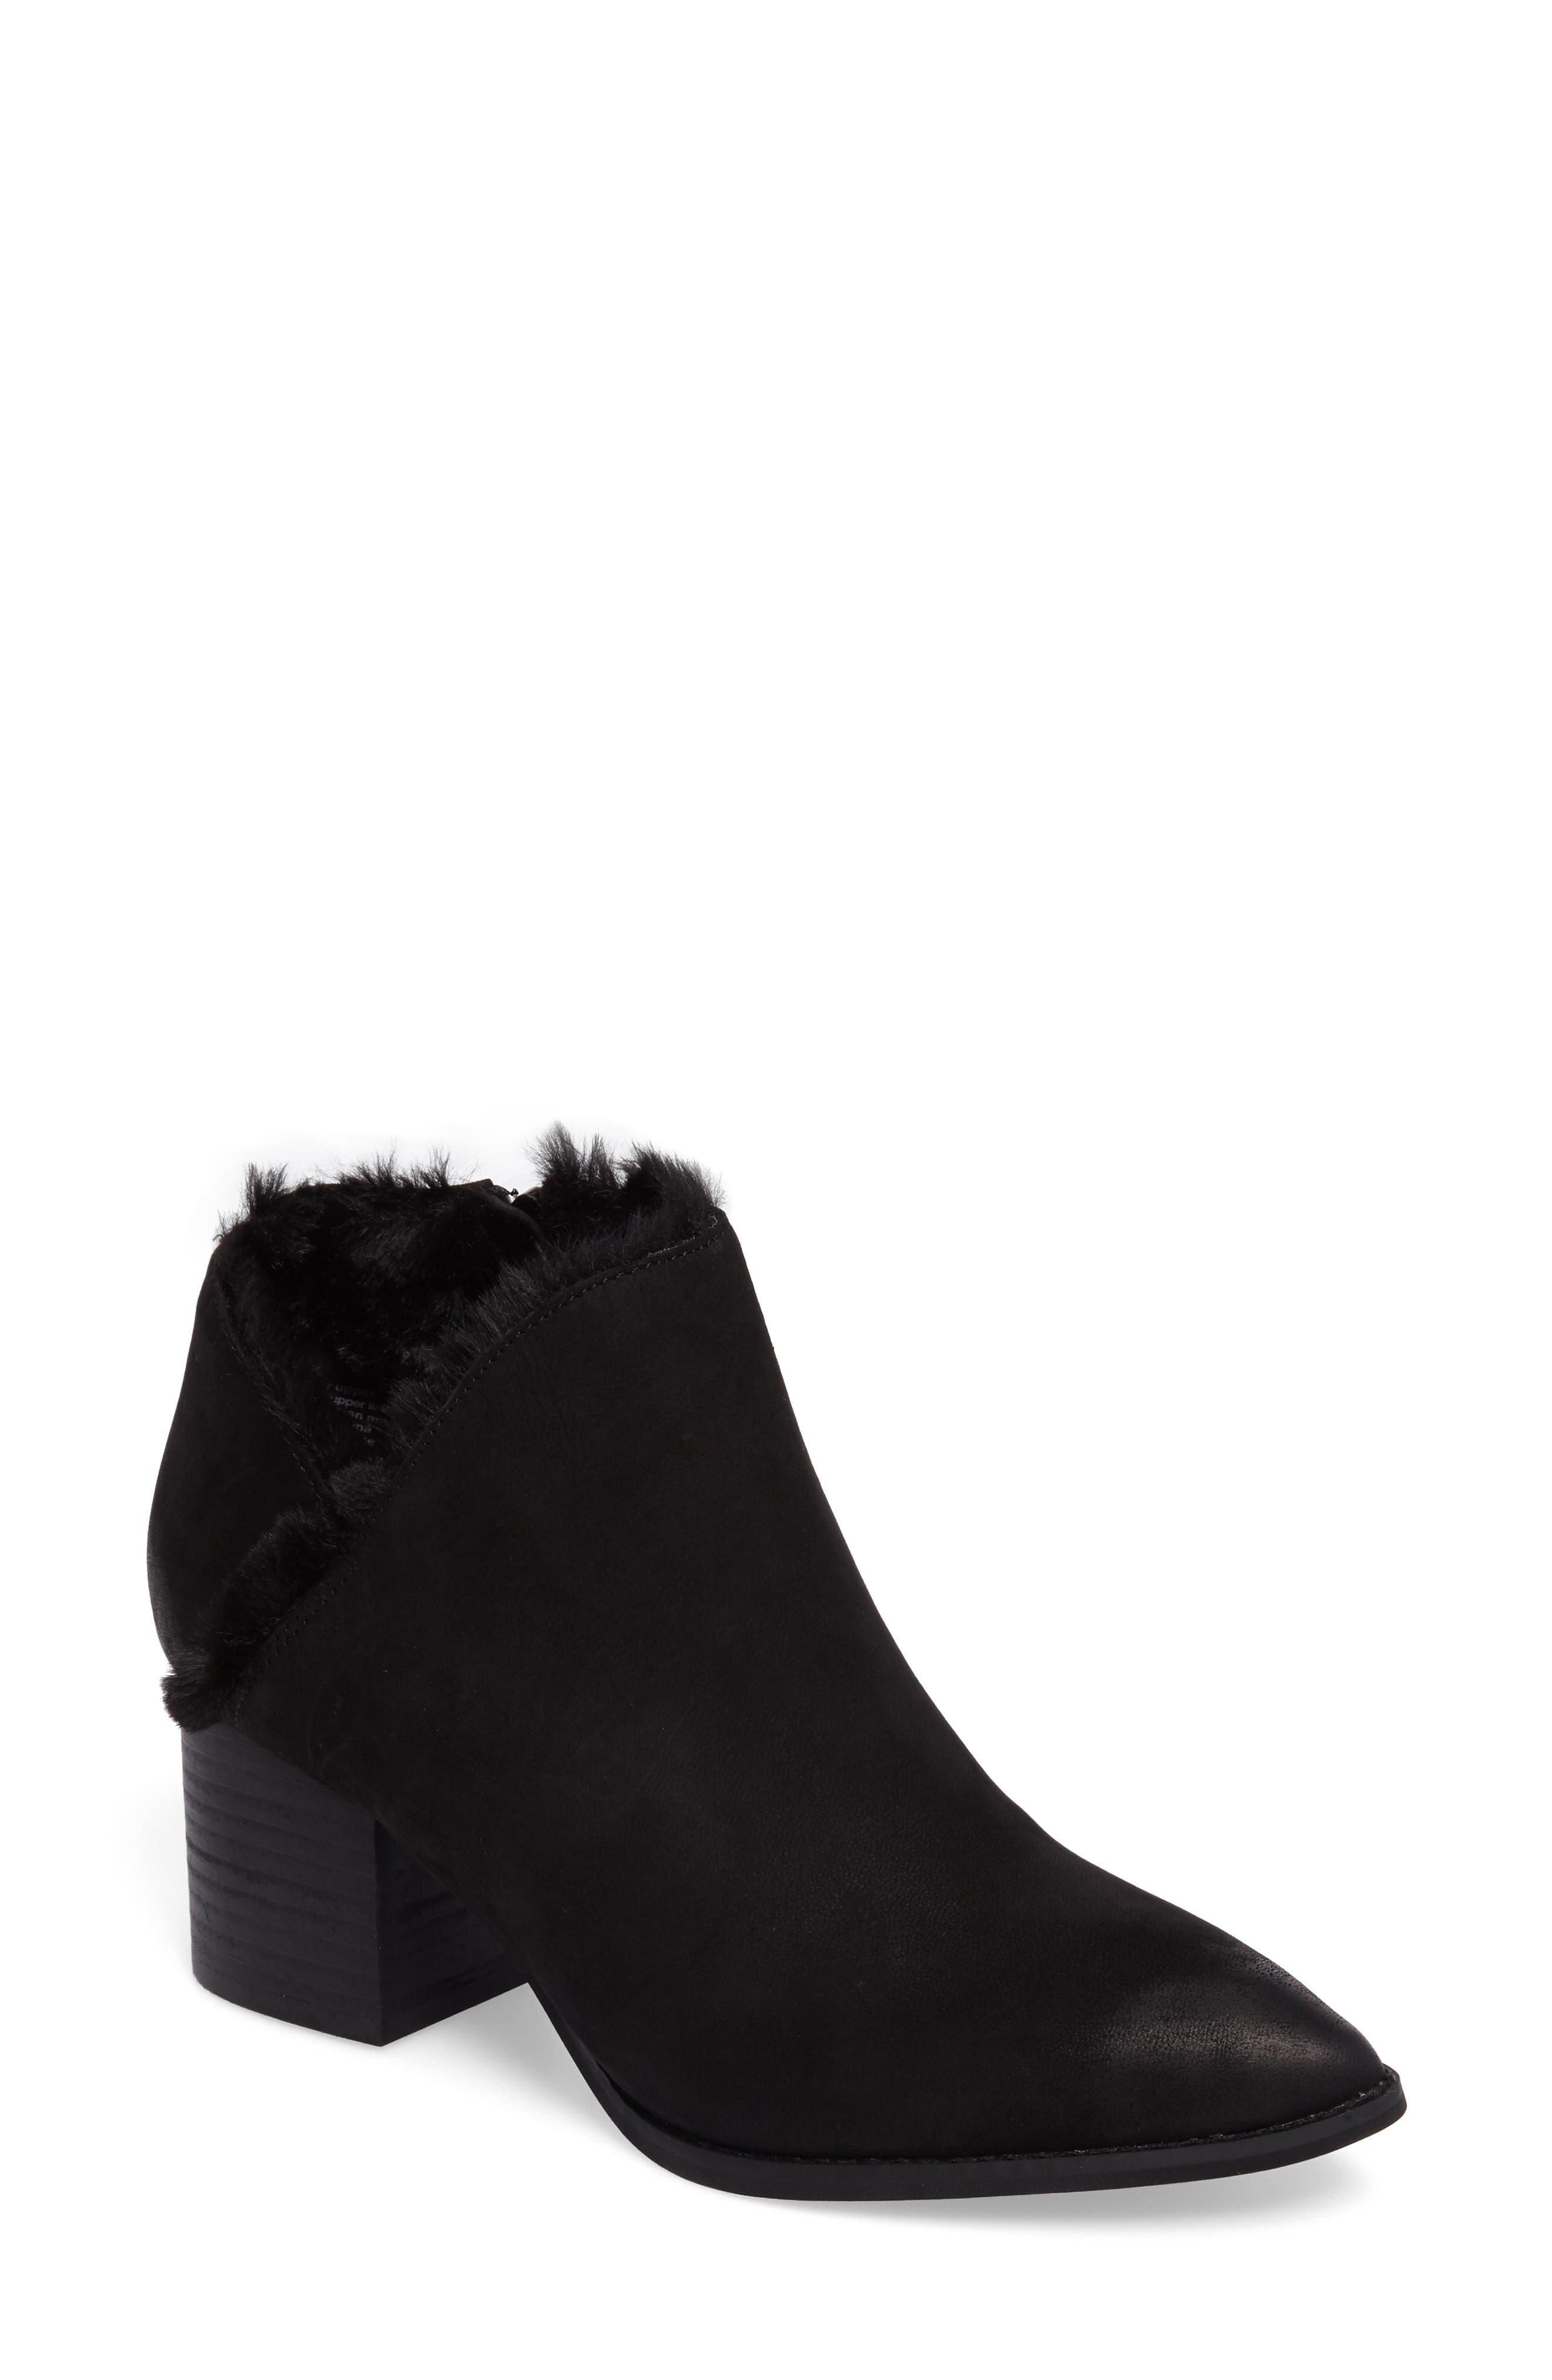 Preview Faux Fur Lined Bootie,                         Main,                         color, Black Leather